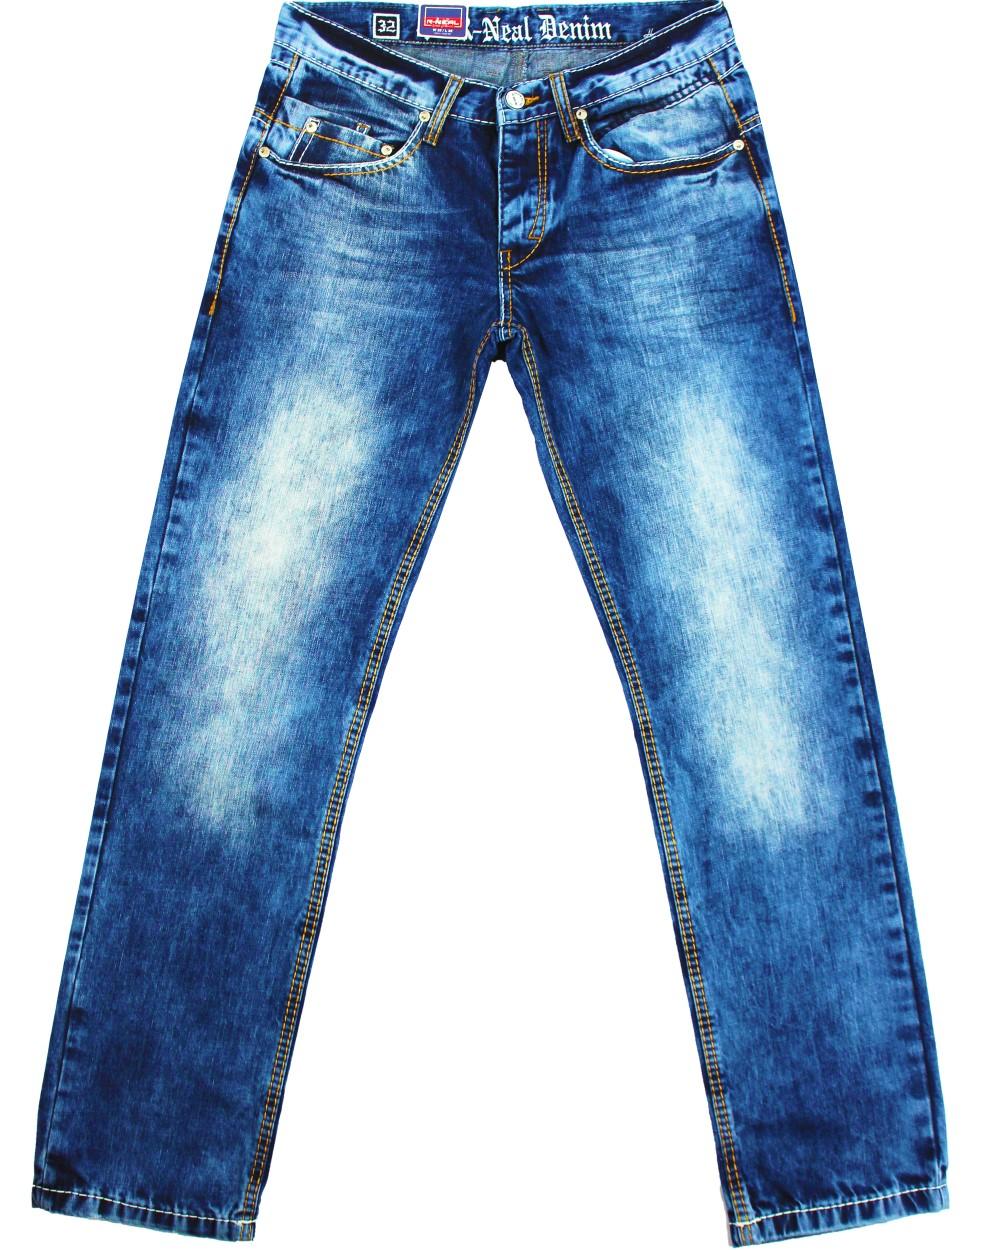 rusty r neal herren star jeans hose freizeithose mens. Black Bedroom Furniture Sets. Home Design Ideas